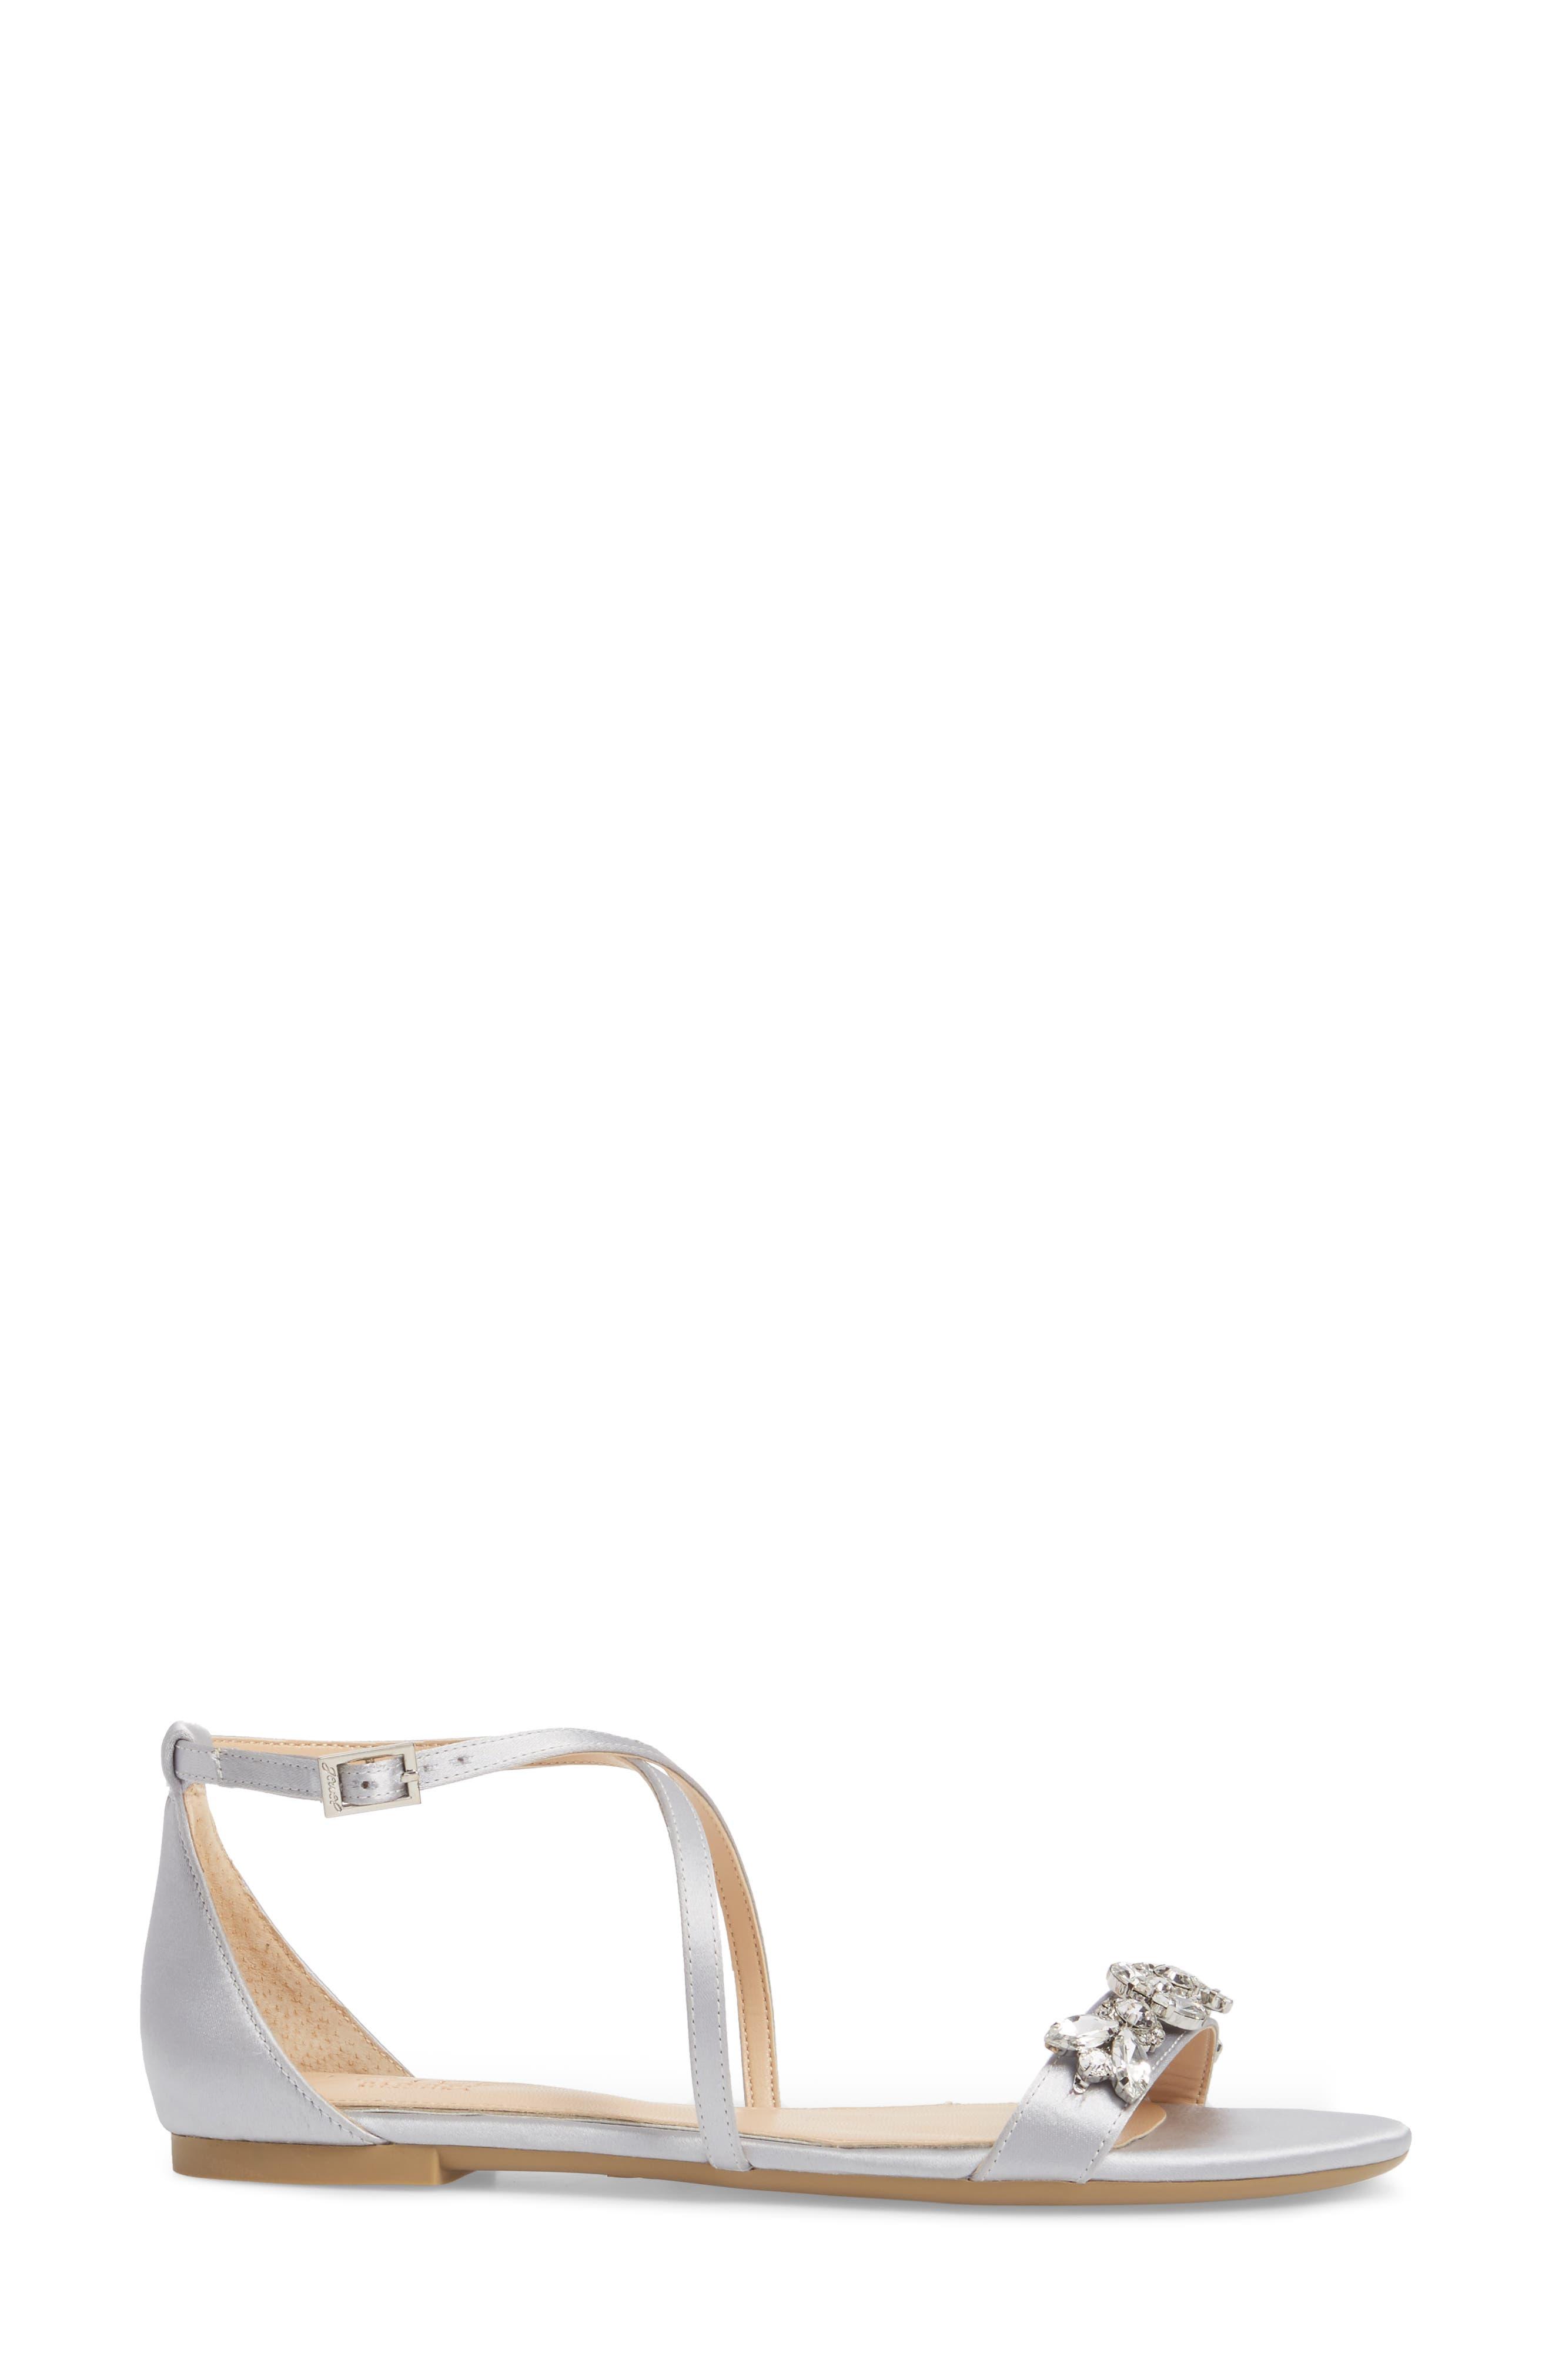 Tessy Embellished Sandal,                             Alternate thumbnail 3, color,                             Silver Satin